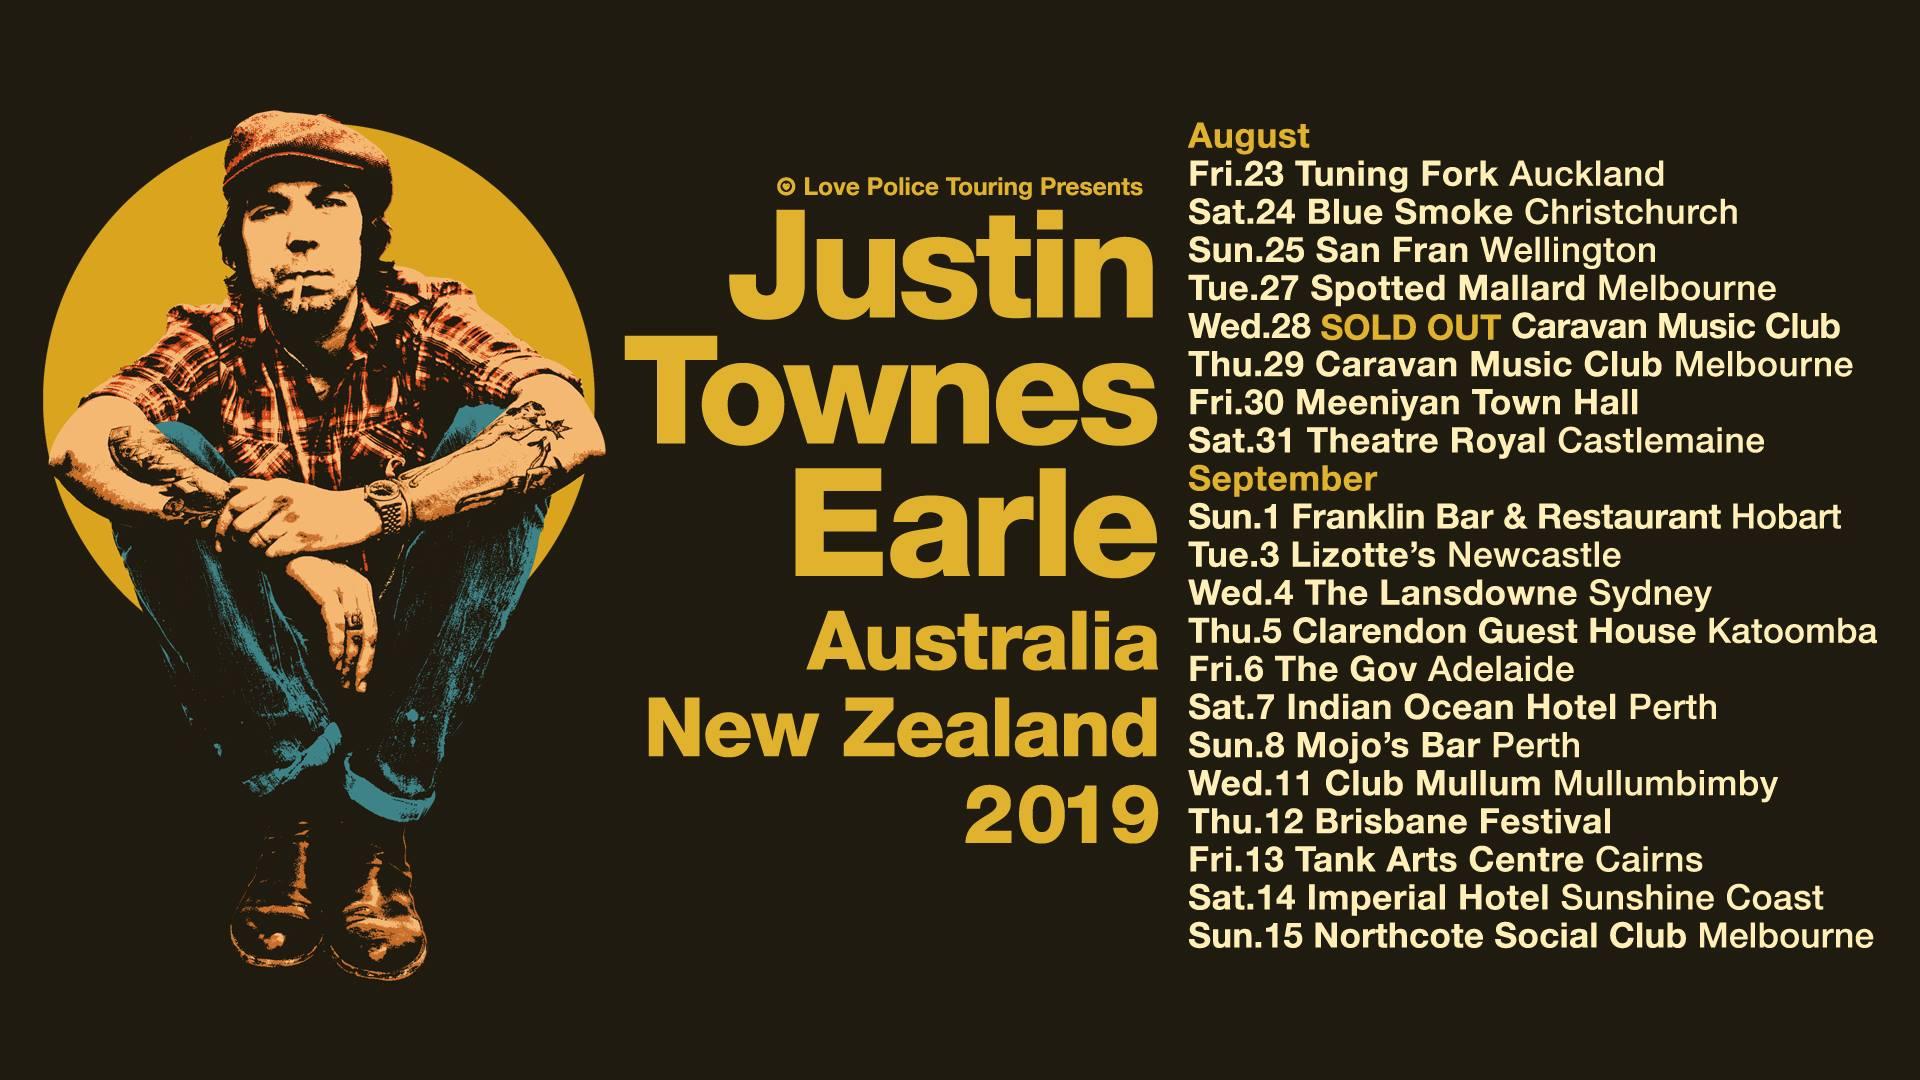 Cairns Events - Music (07 September 2019 - 30 September 2021)